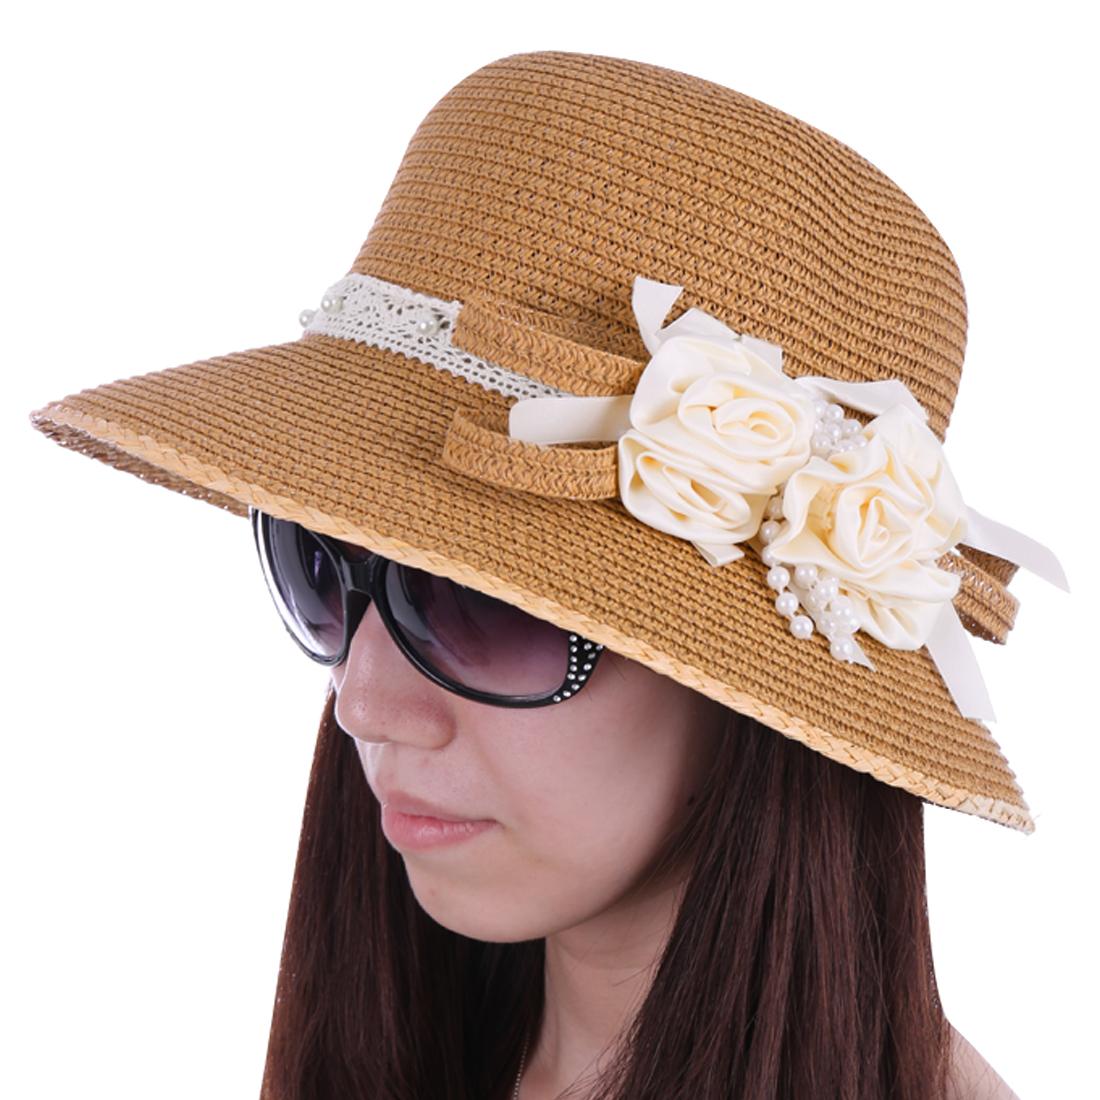 Women Woven Straw Crochet Strap Detail Sun Hat Light Brown